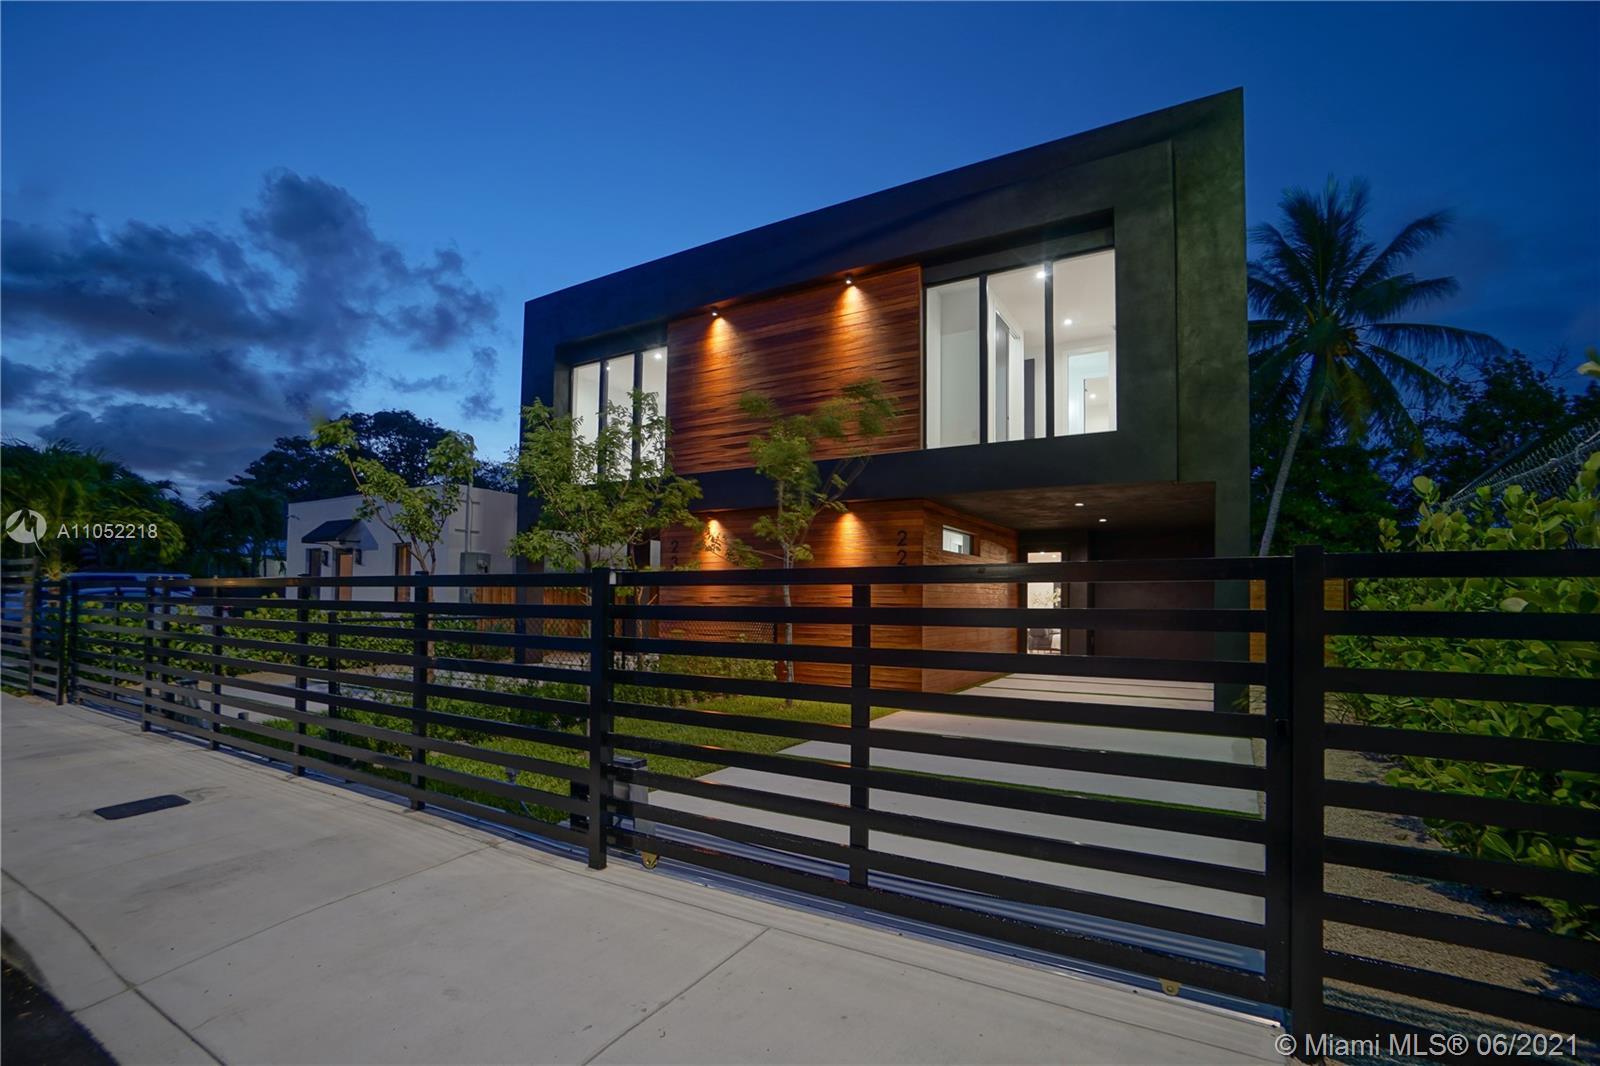 Bay Vista Park - 227 NW 39th St, Miami, FL 33127